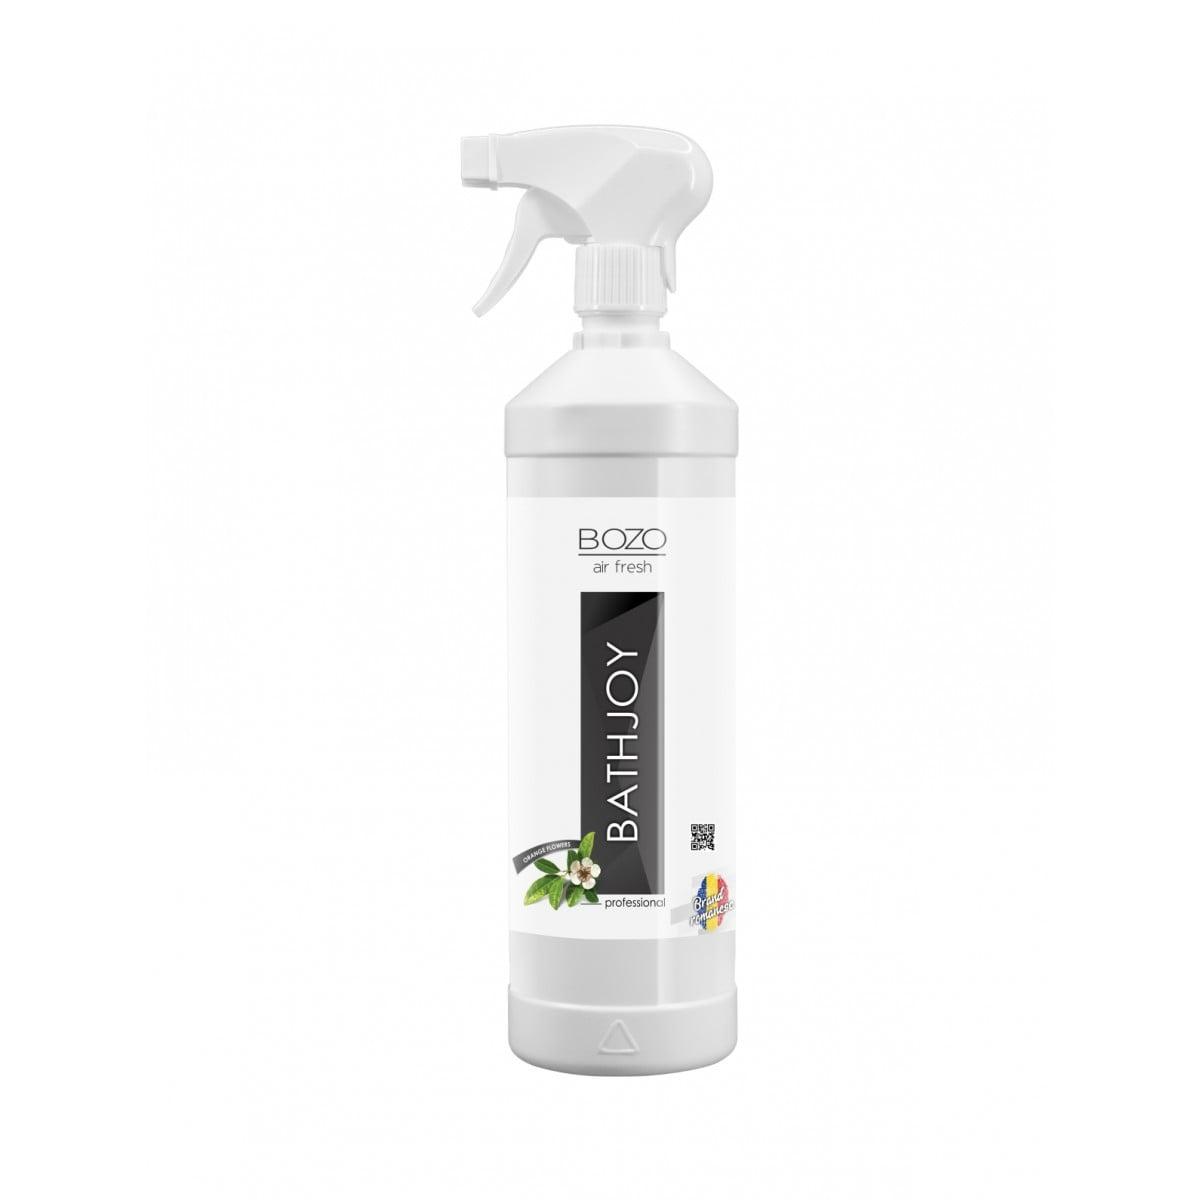 Odorizant ambiental concentrat cu aroma flori de portocal, Bozo Air Fresh - BATHJOY - 500ml imagine 2021 somnart.ro